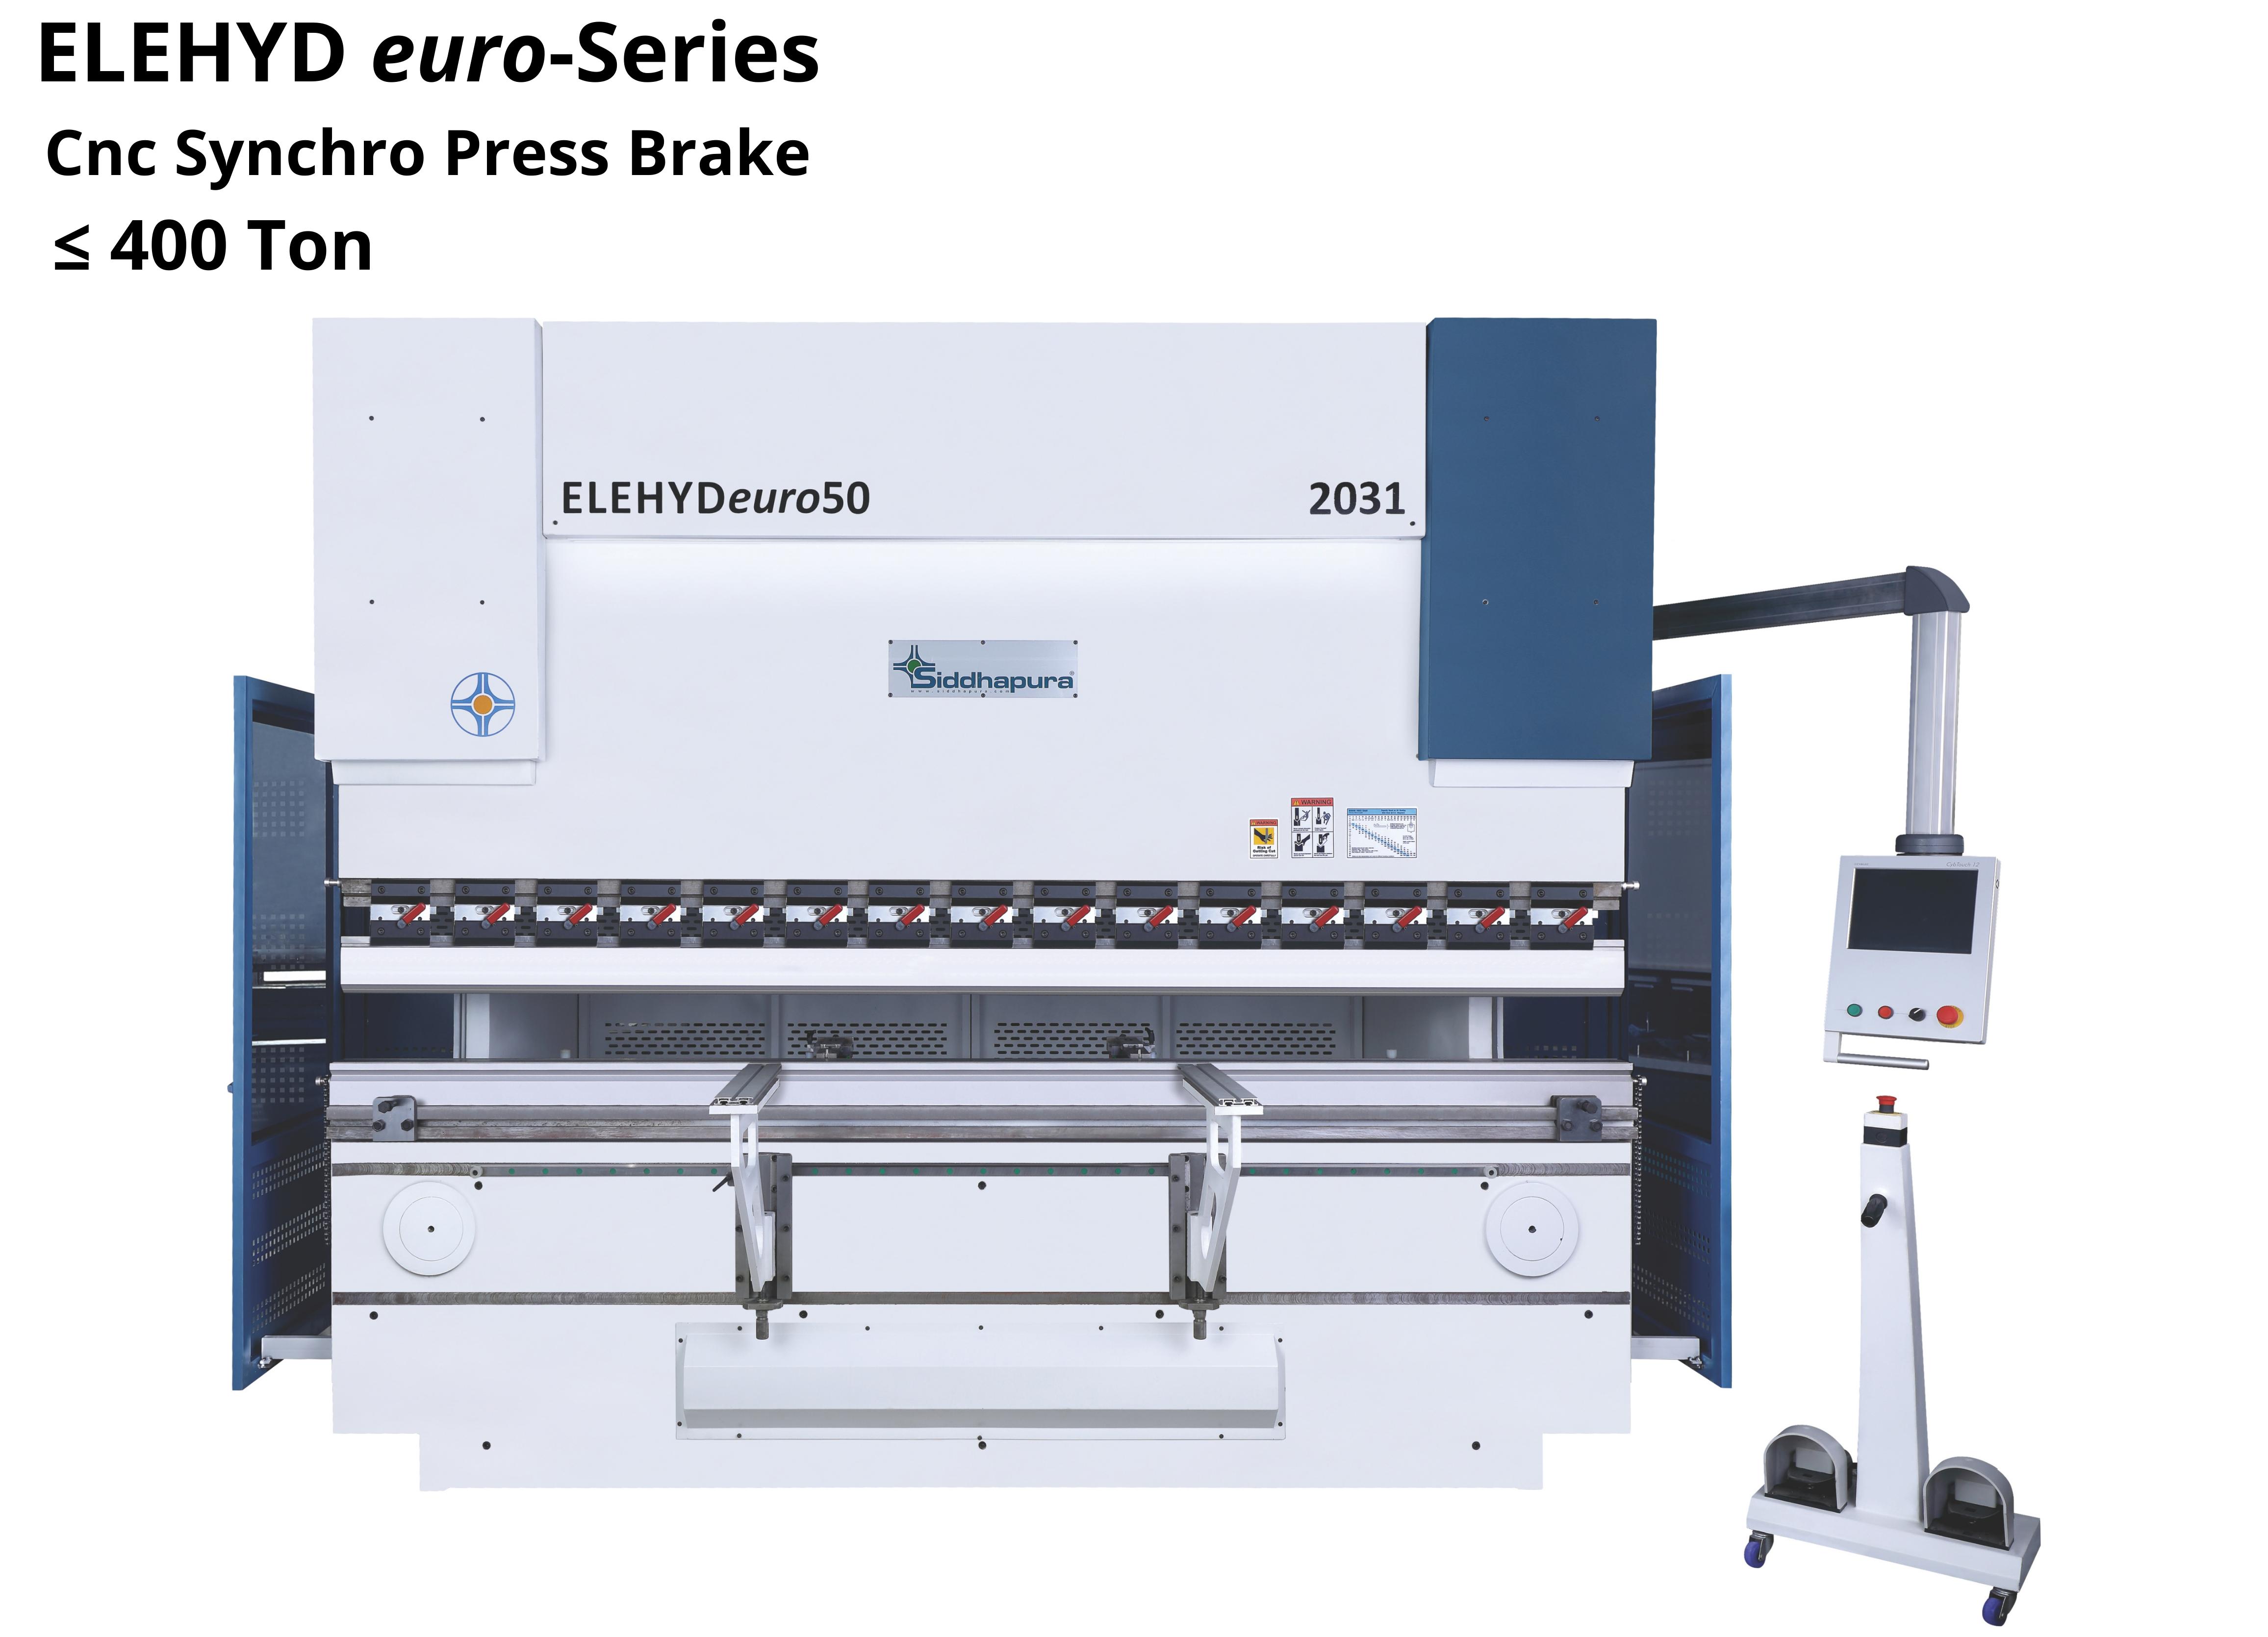 ELEHYD euro-Series Cnc Synchro Press Brake